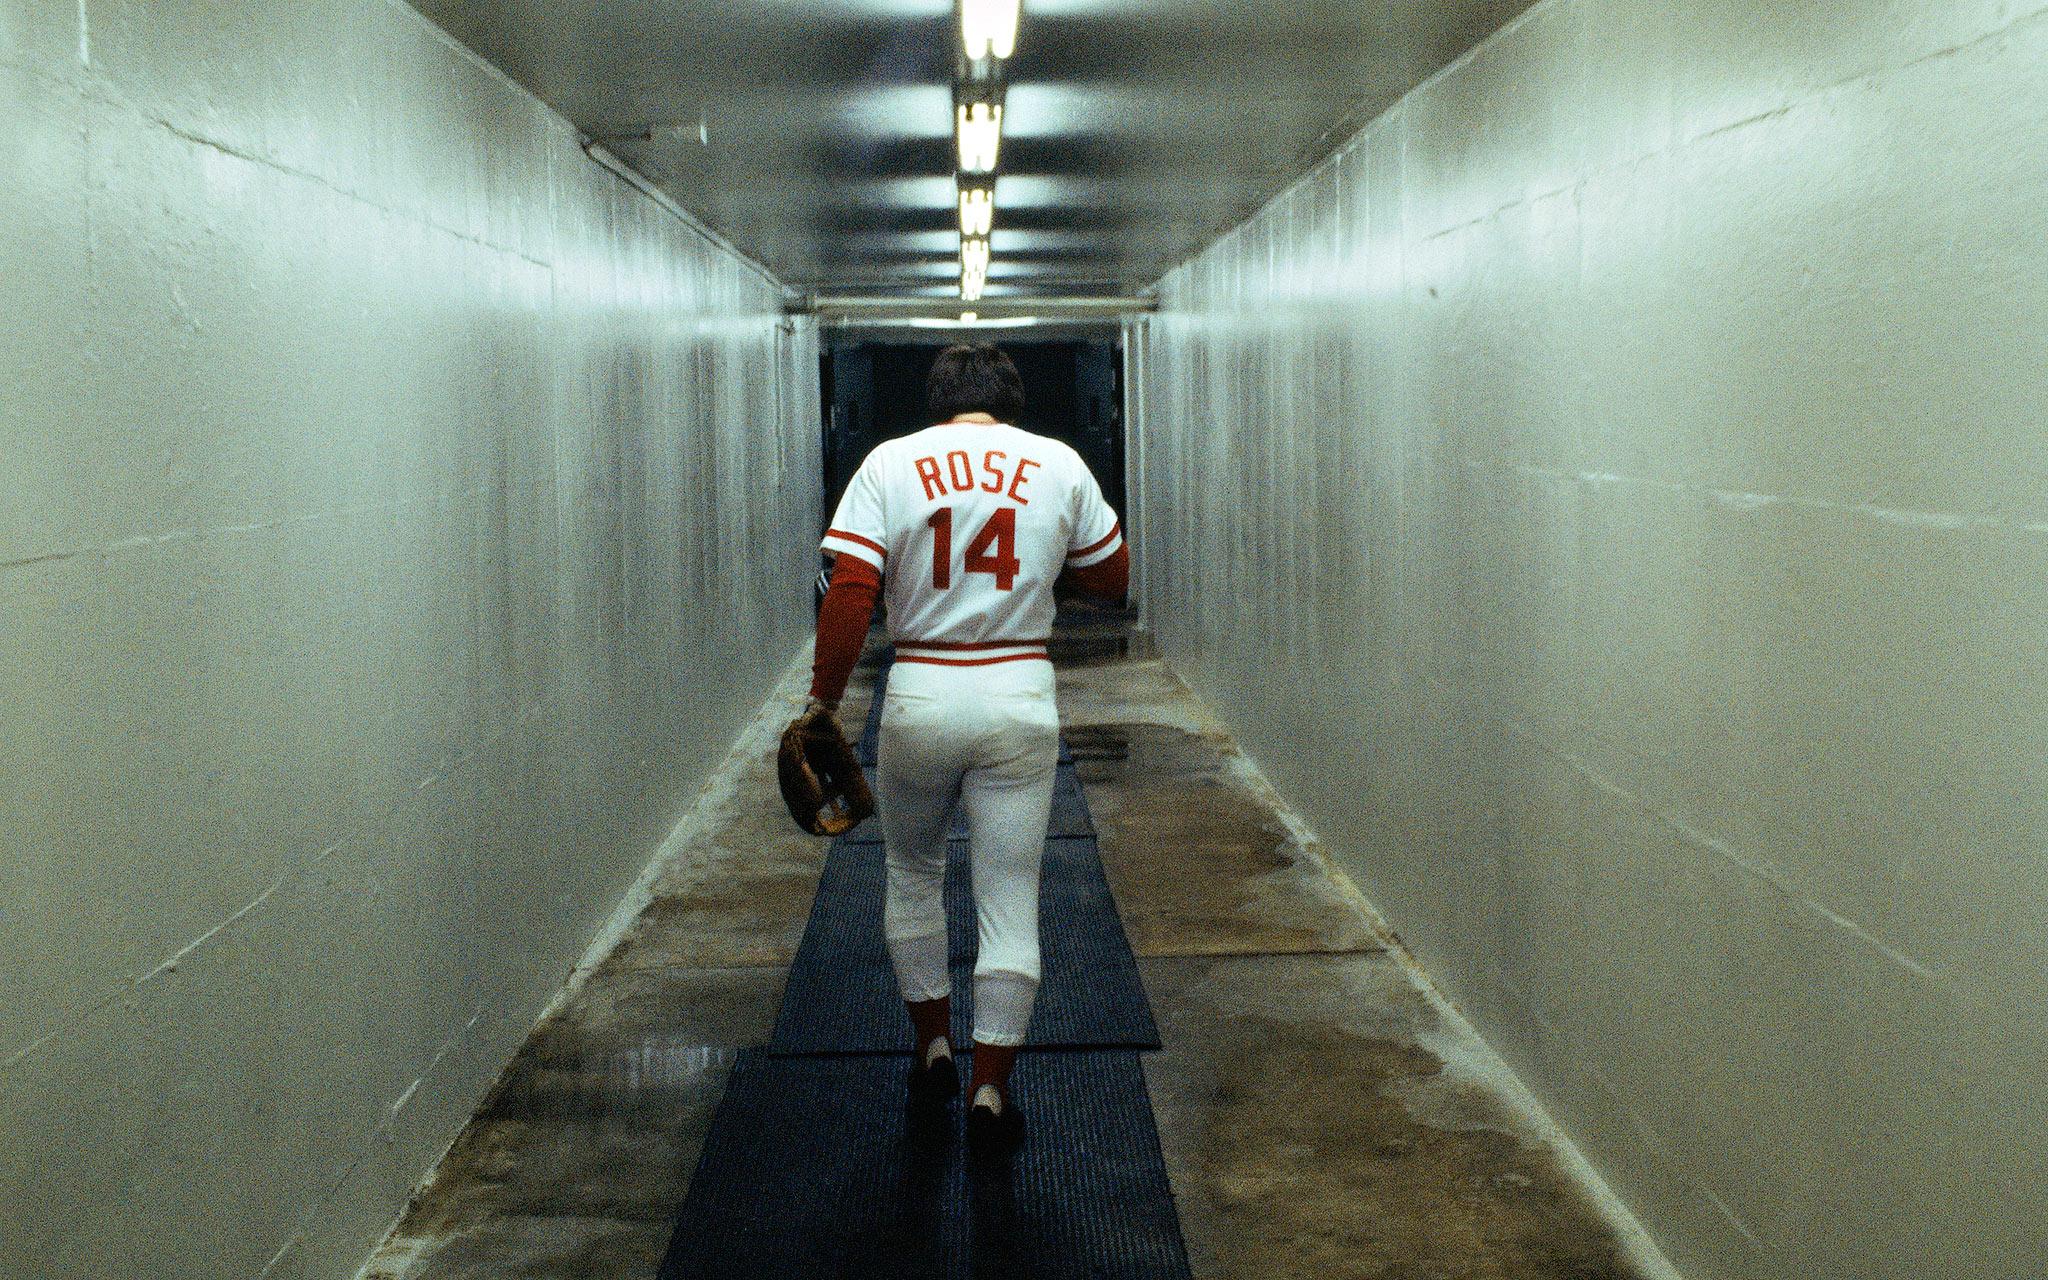 CINCINNATI - UNDATED: Outfielder Pete Rose #14 of the Cincinnati Reds walks alone down a vacant corridor at Riverfront Stadium during the 1970s in Cincinnati, Ohio.